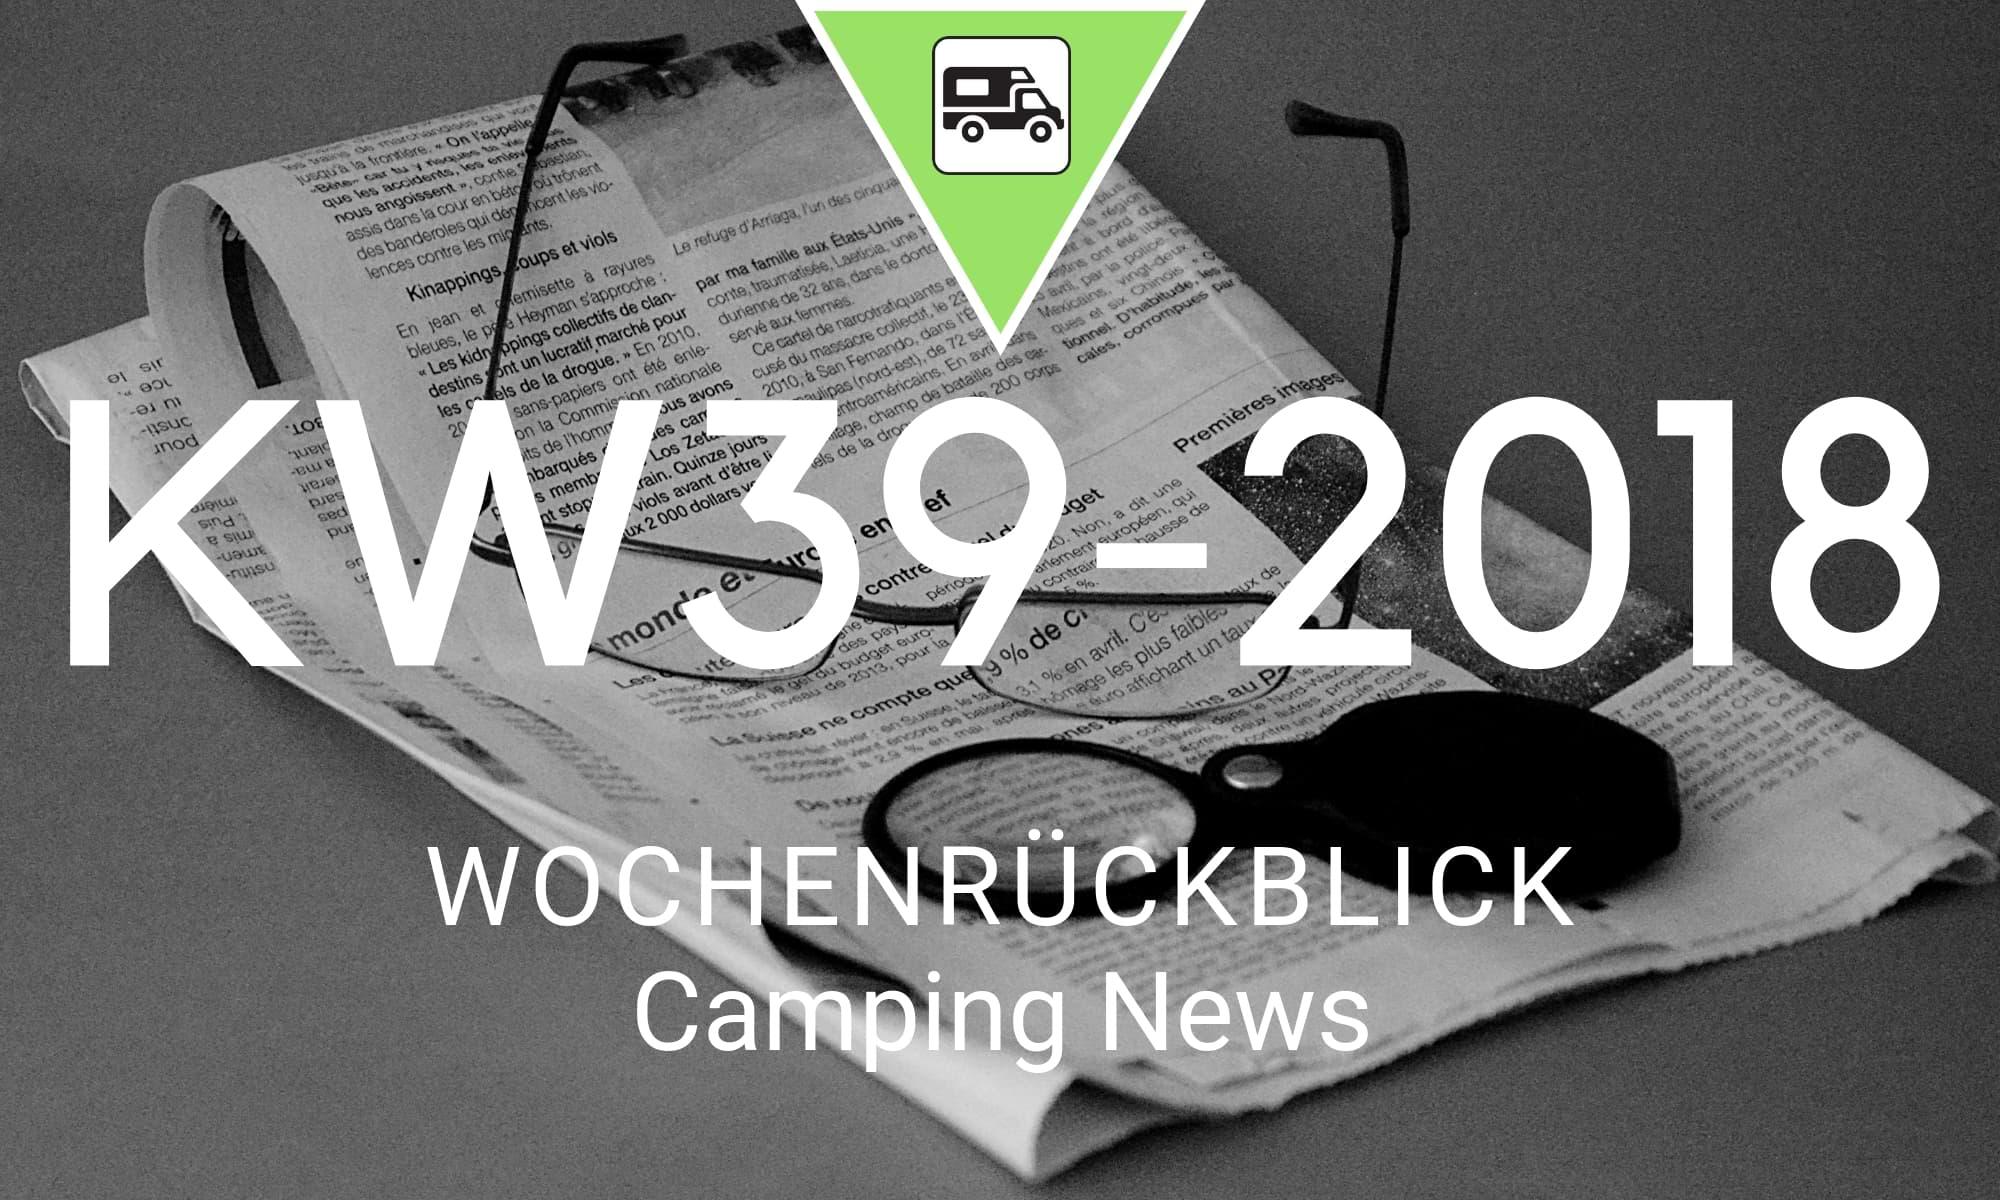 Wochenrückblick Camping News KW39-2018